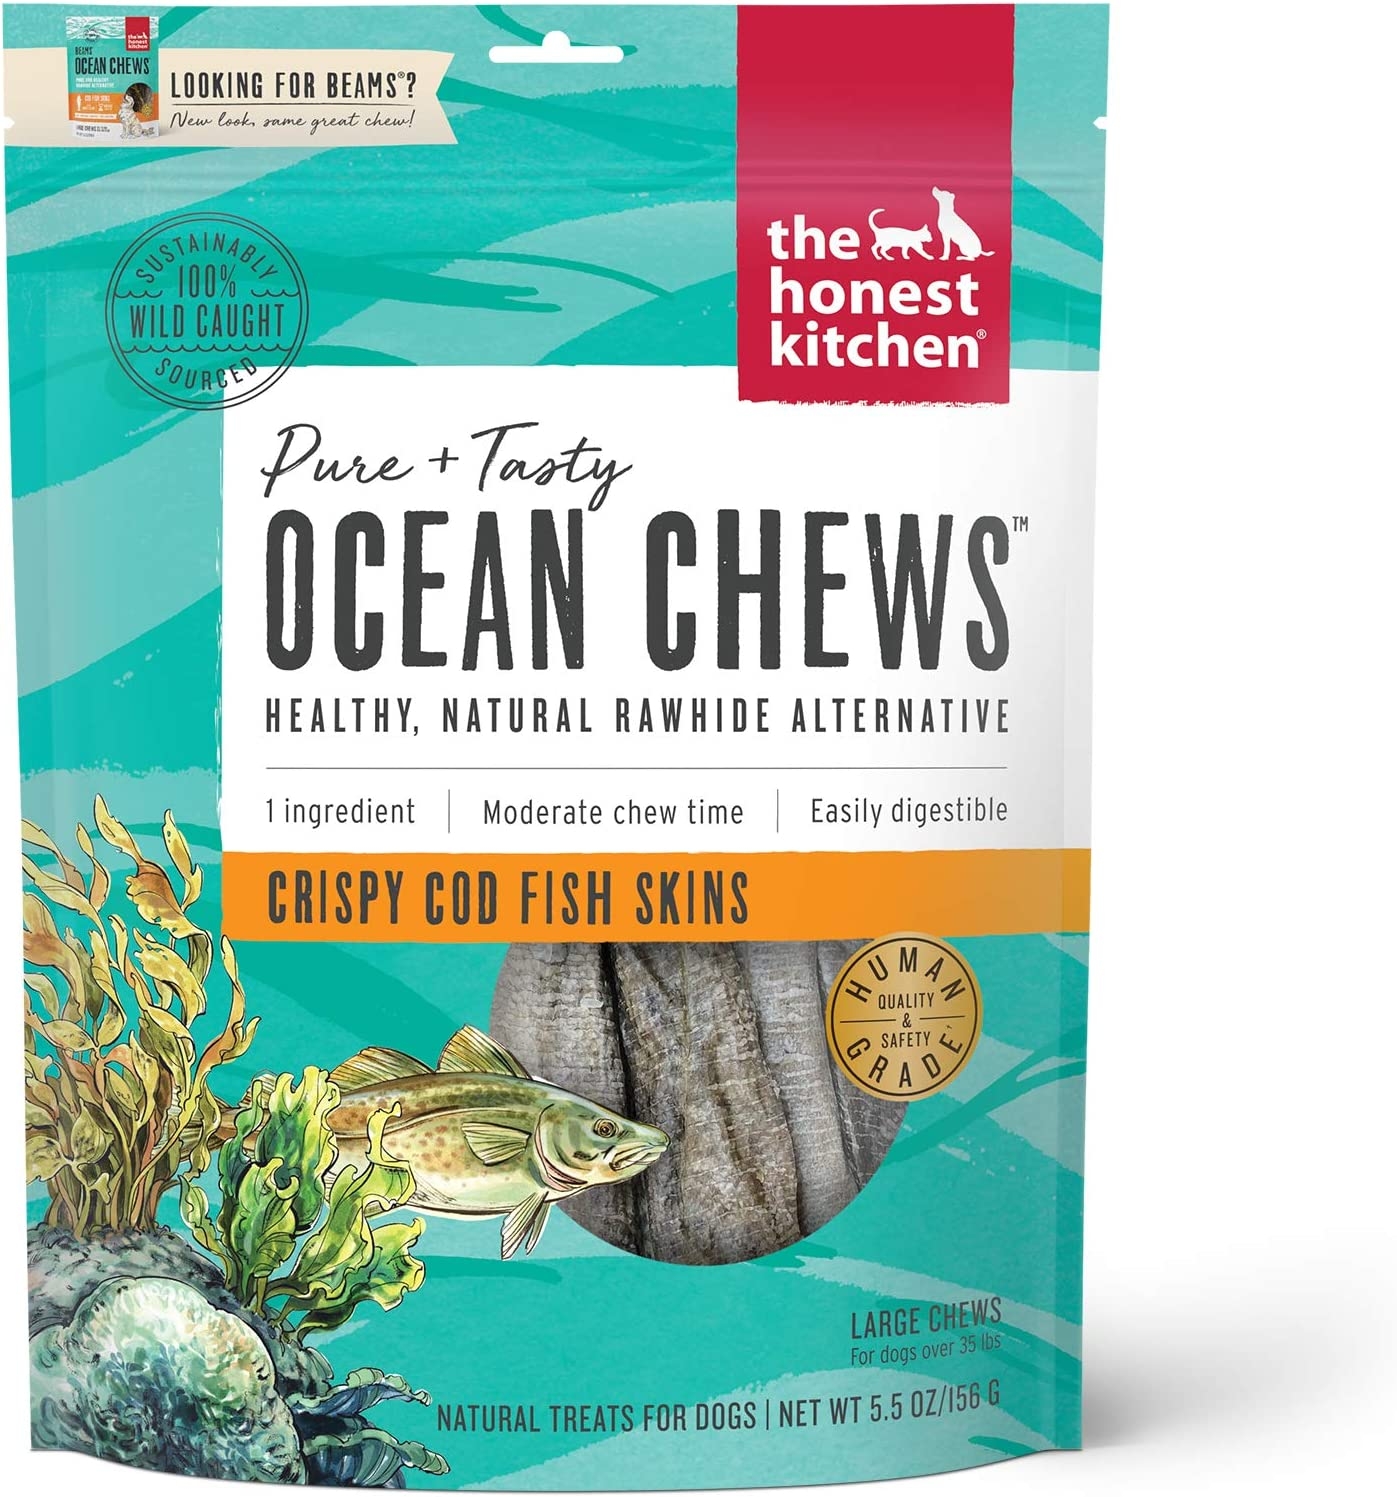 The Honest Kitchen Ocean Chews Grain Free Dog Chew Treats – Natural Human Grade Dehydrated Fish Skins